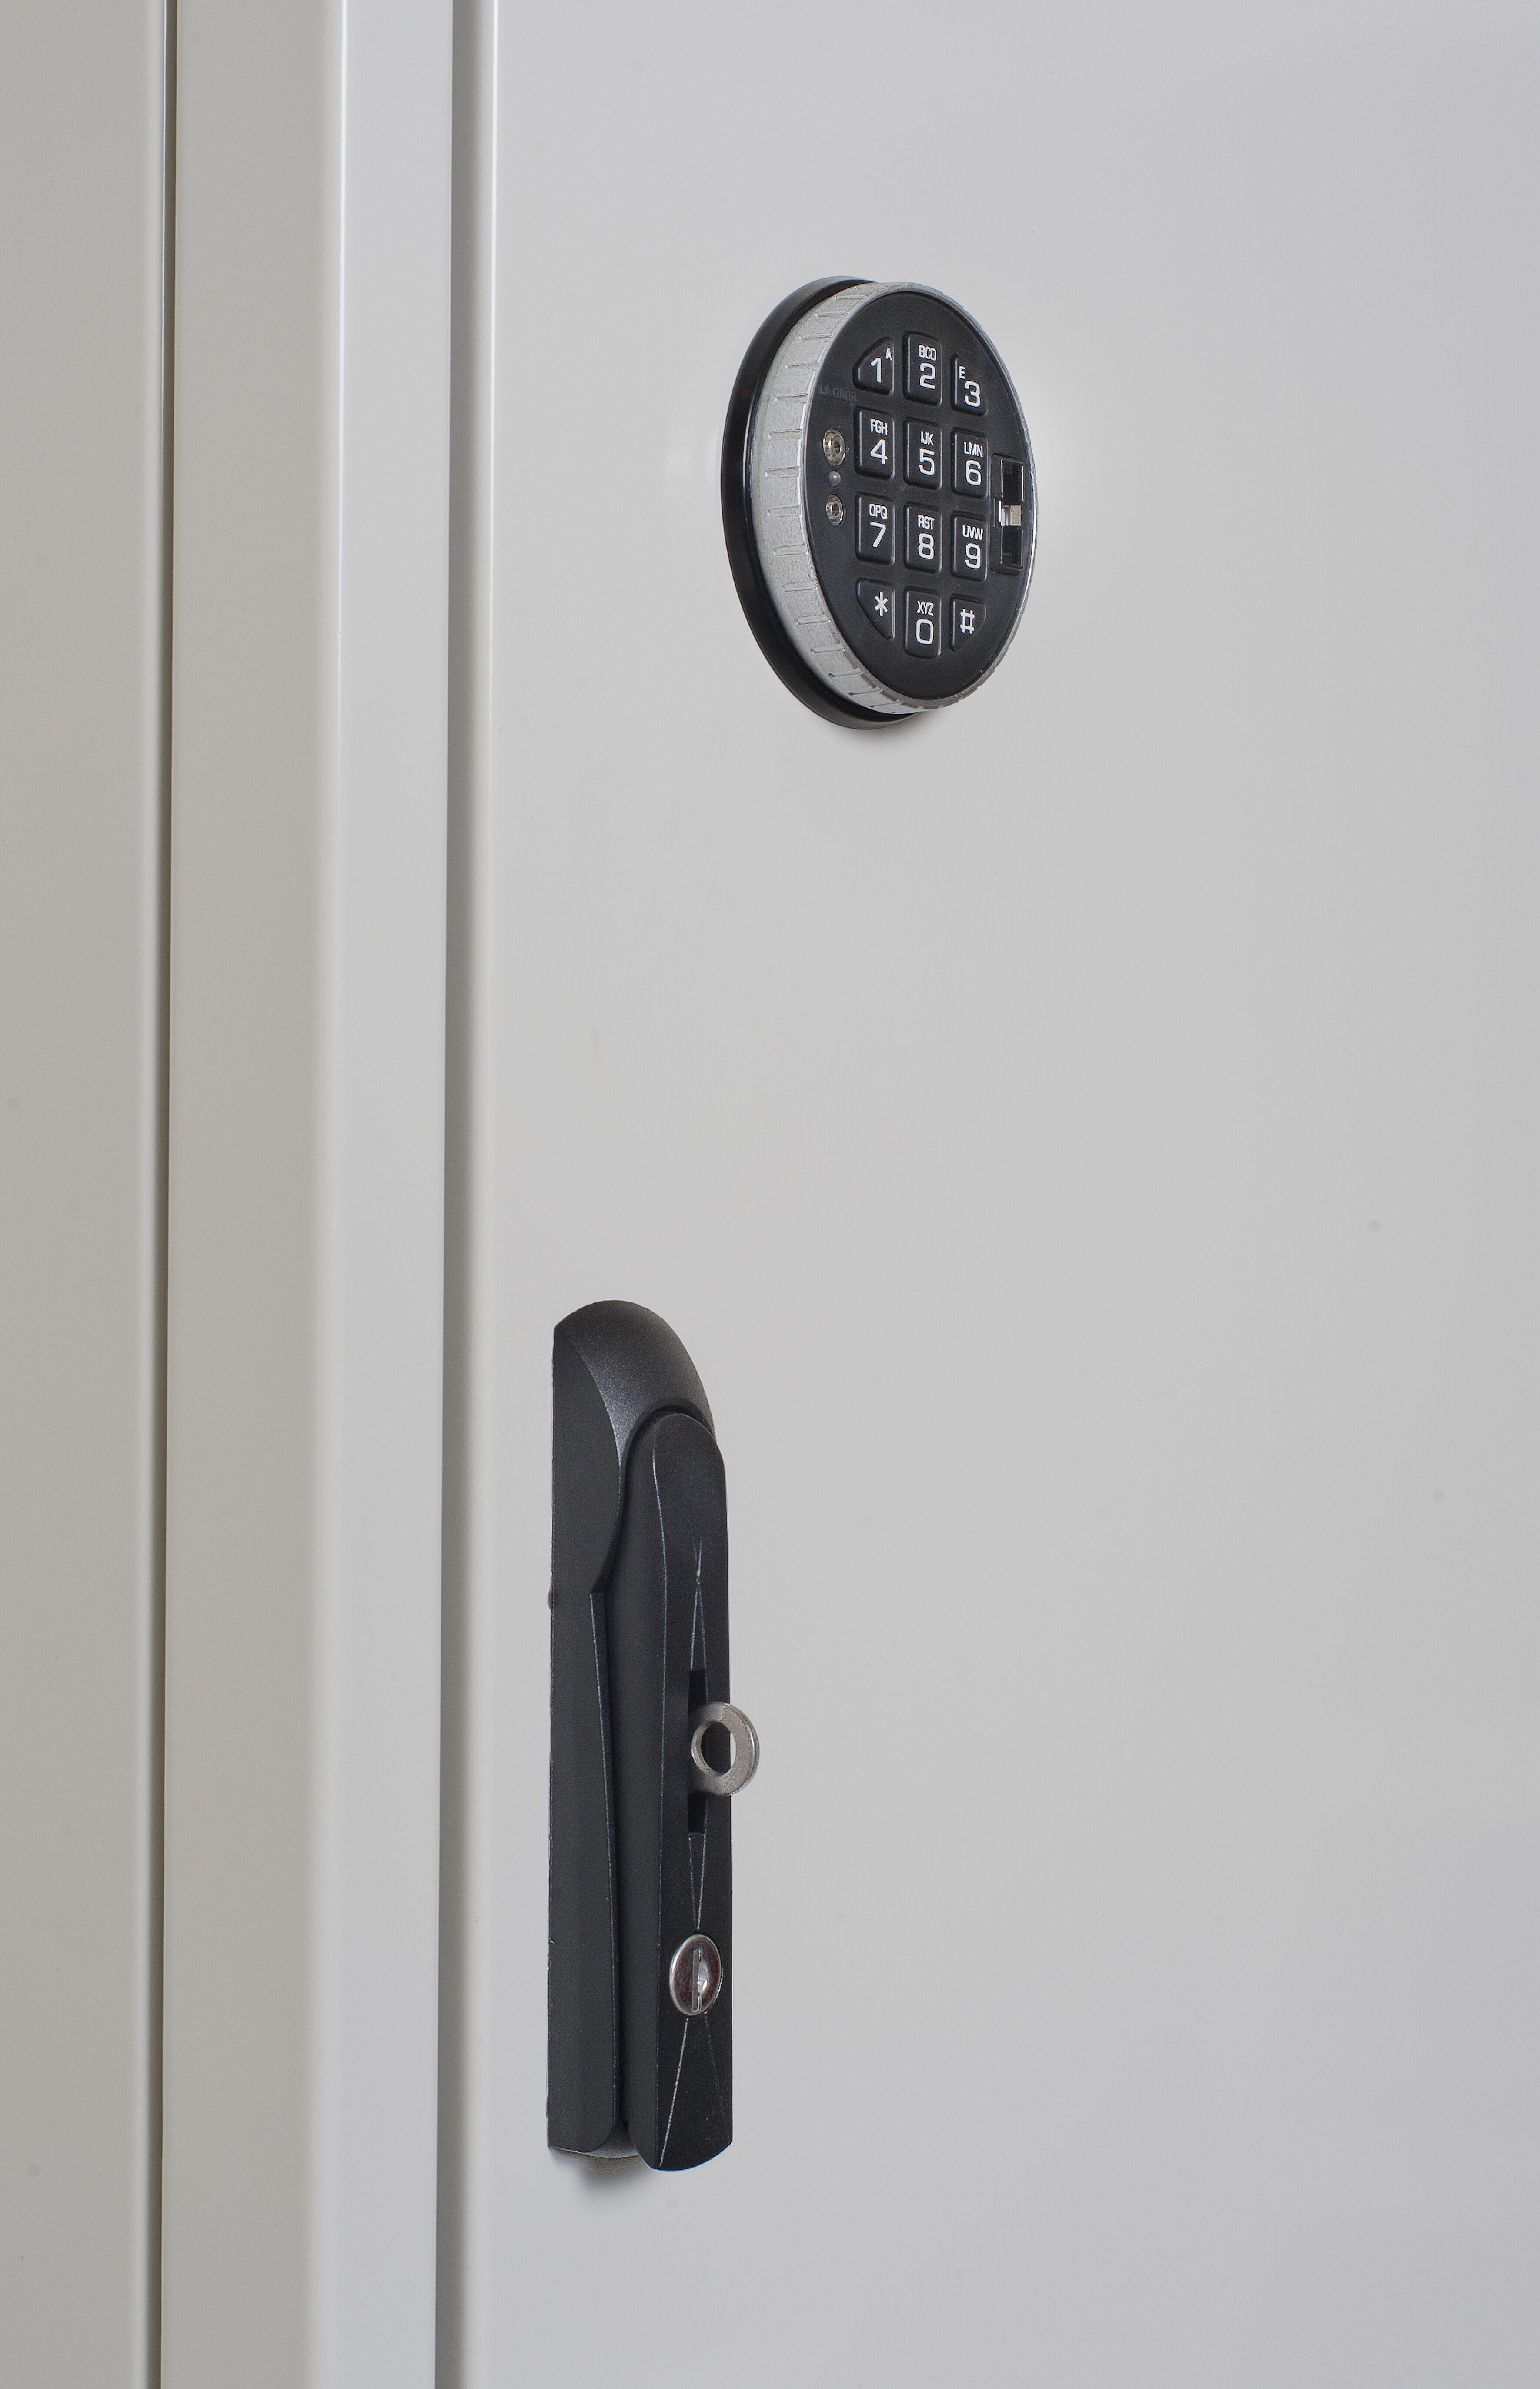 Secureitlvl2b